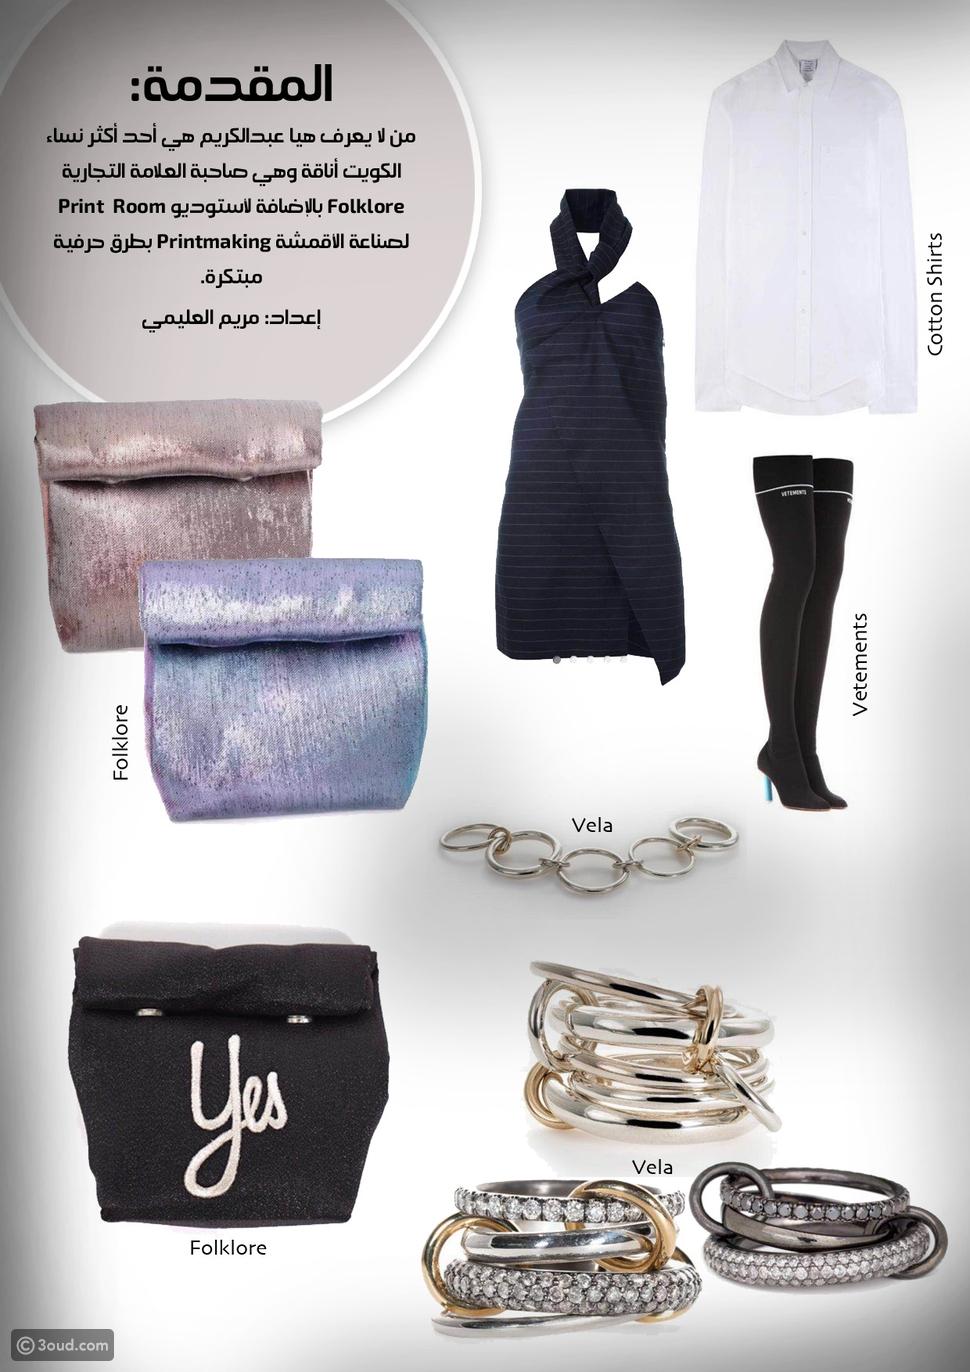 Haya AbdulKareem Eid Picks (مختارات هيا عبدالكريم الأنيقة لهذا العيد)